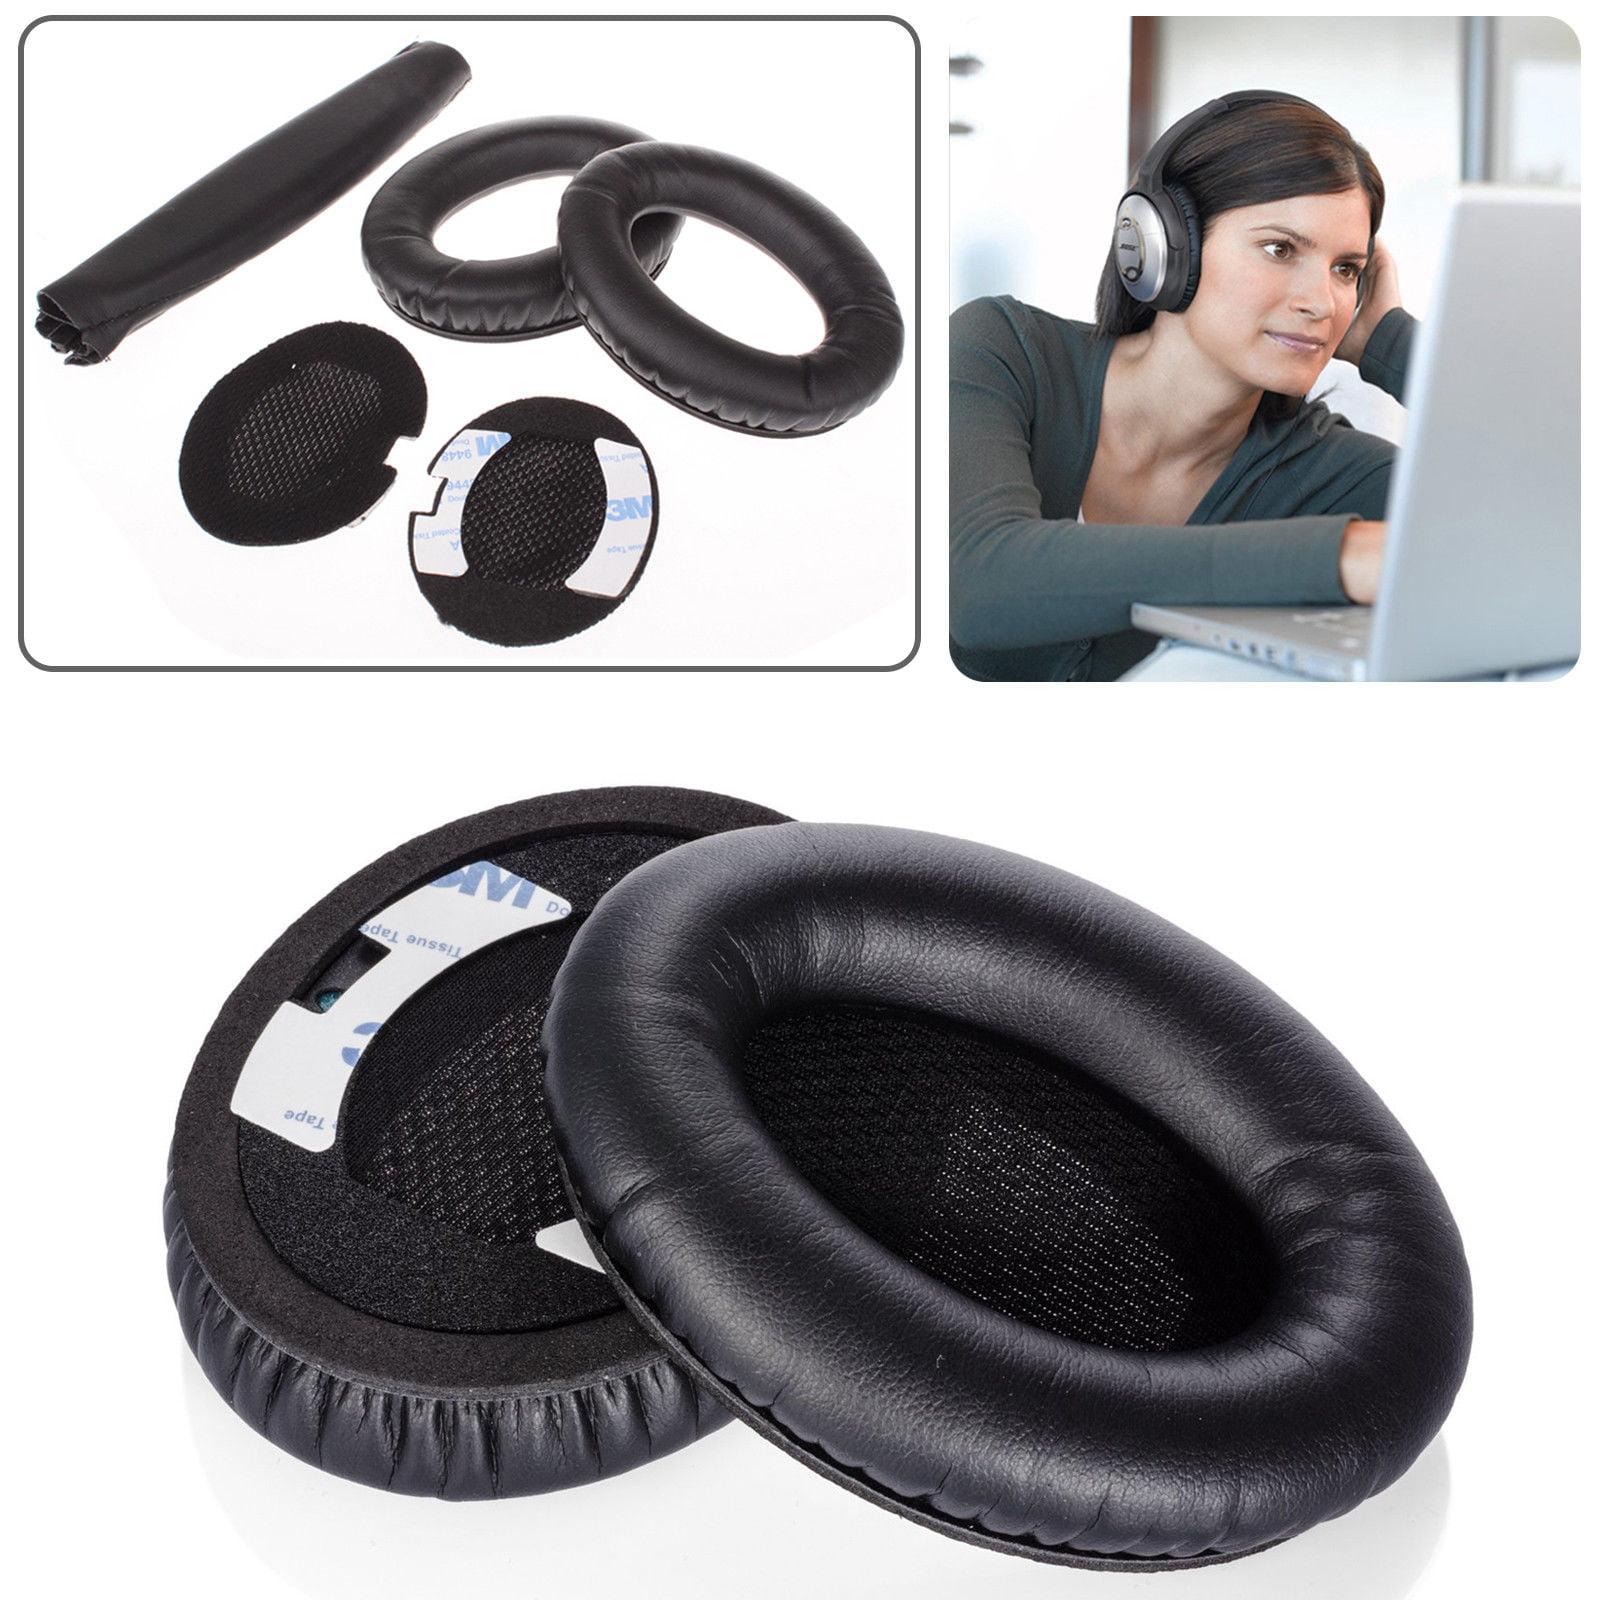 TSV Boses Quiet Comfort QC2, QC15 Headphone Replacement Ear Pad + Headband Cover   Ear Cushion   Ear Cups   Ear Cover  ... by TSV